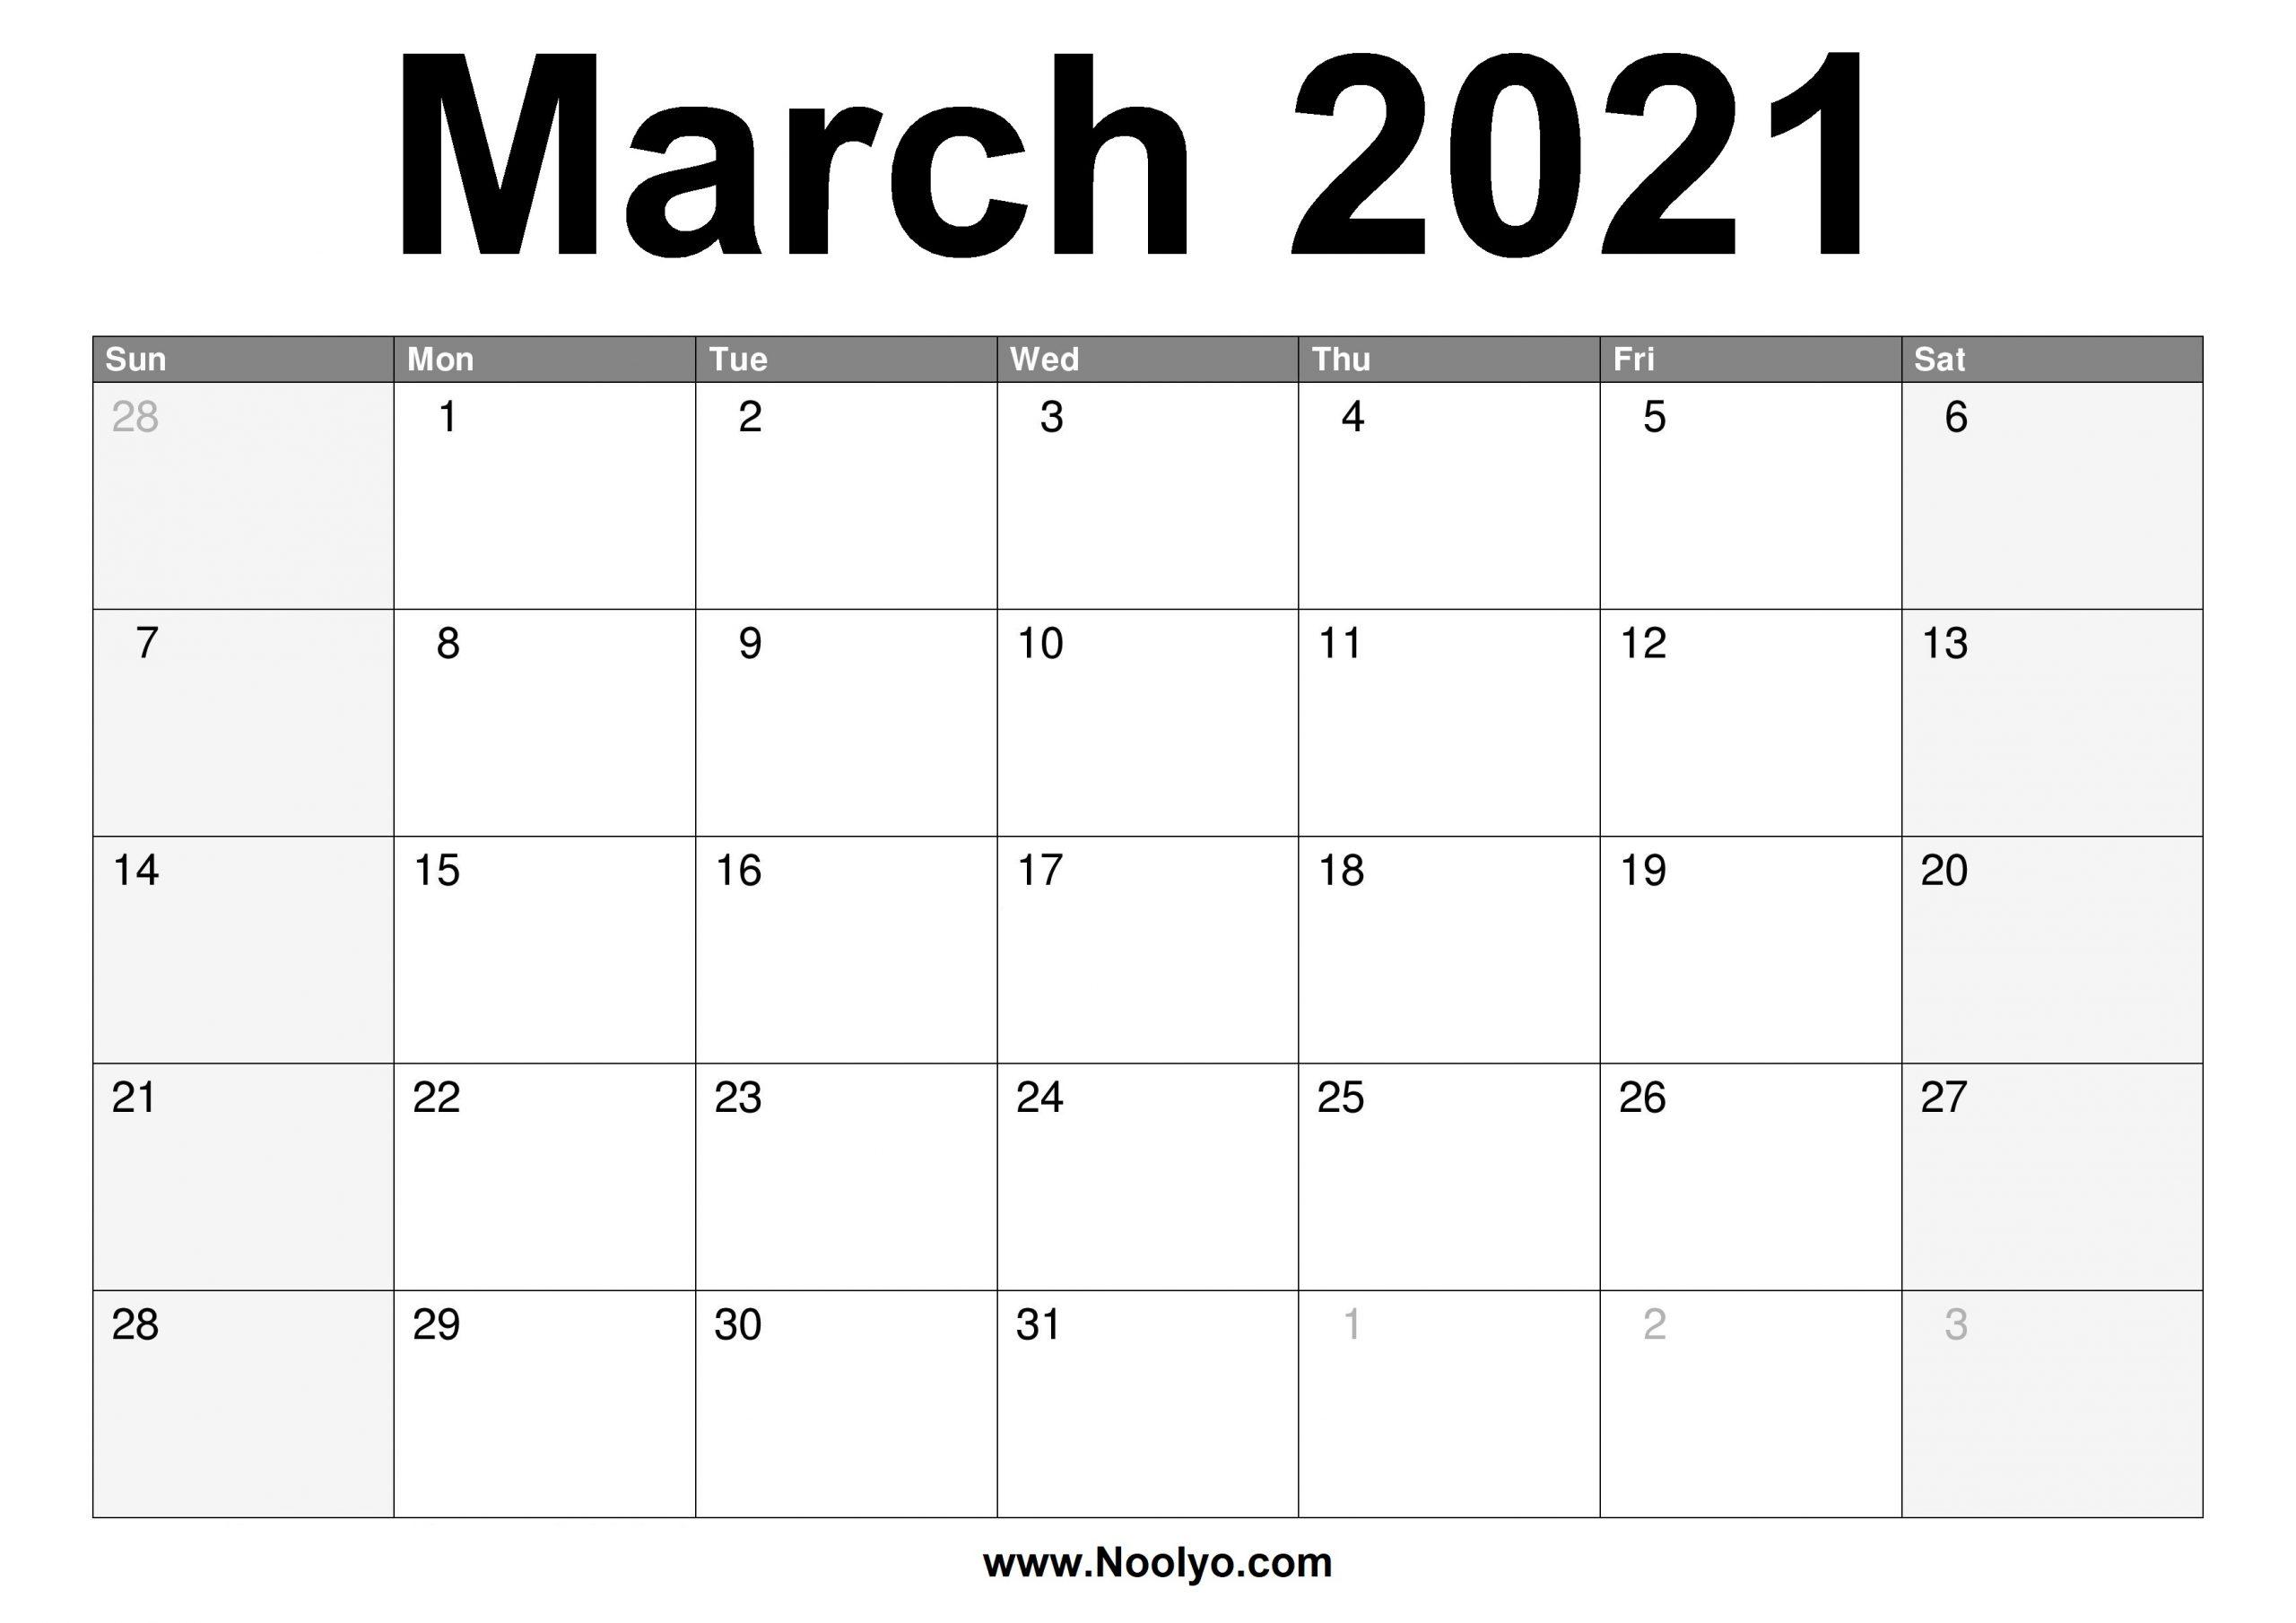 Print March Calendar 2021 | Printable March For Wiki January 2022 Calendar